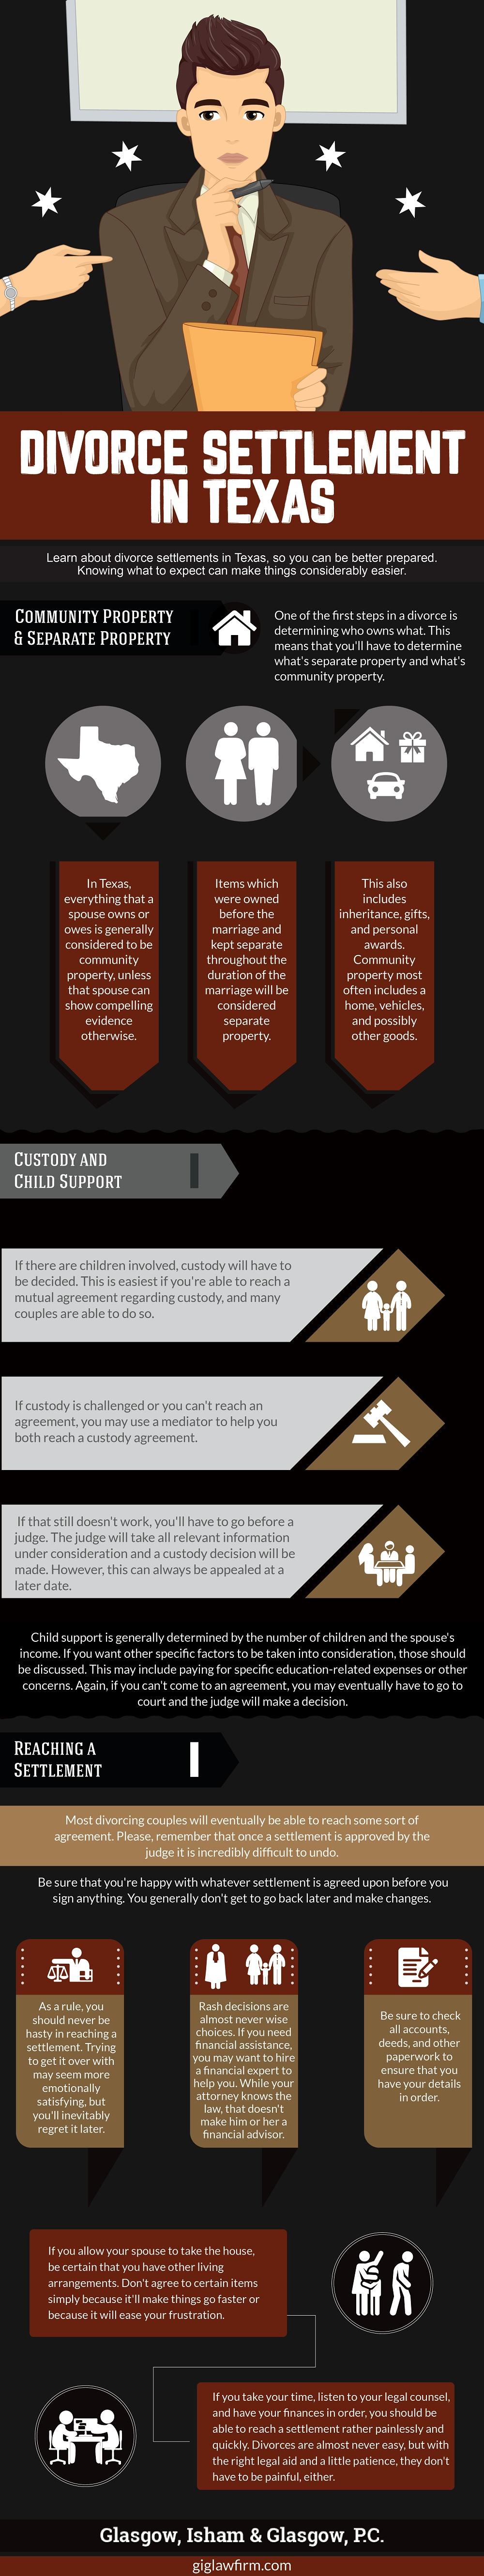 Divorce Settlement In Texas